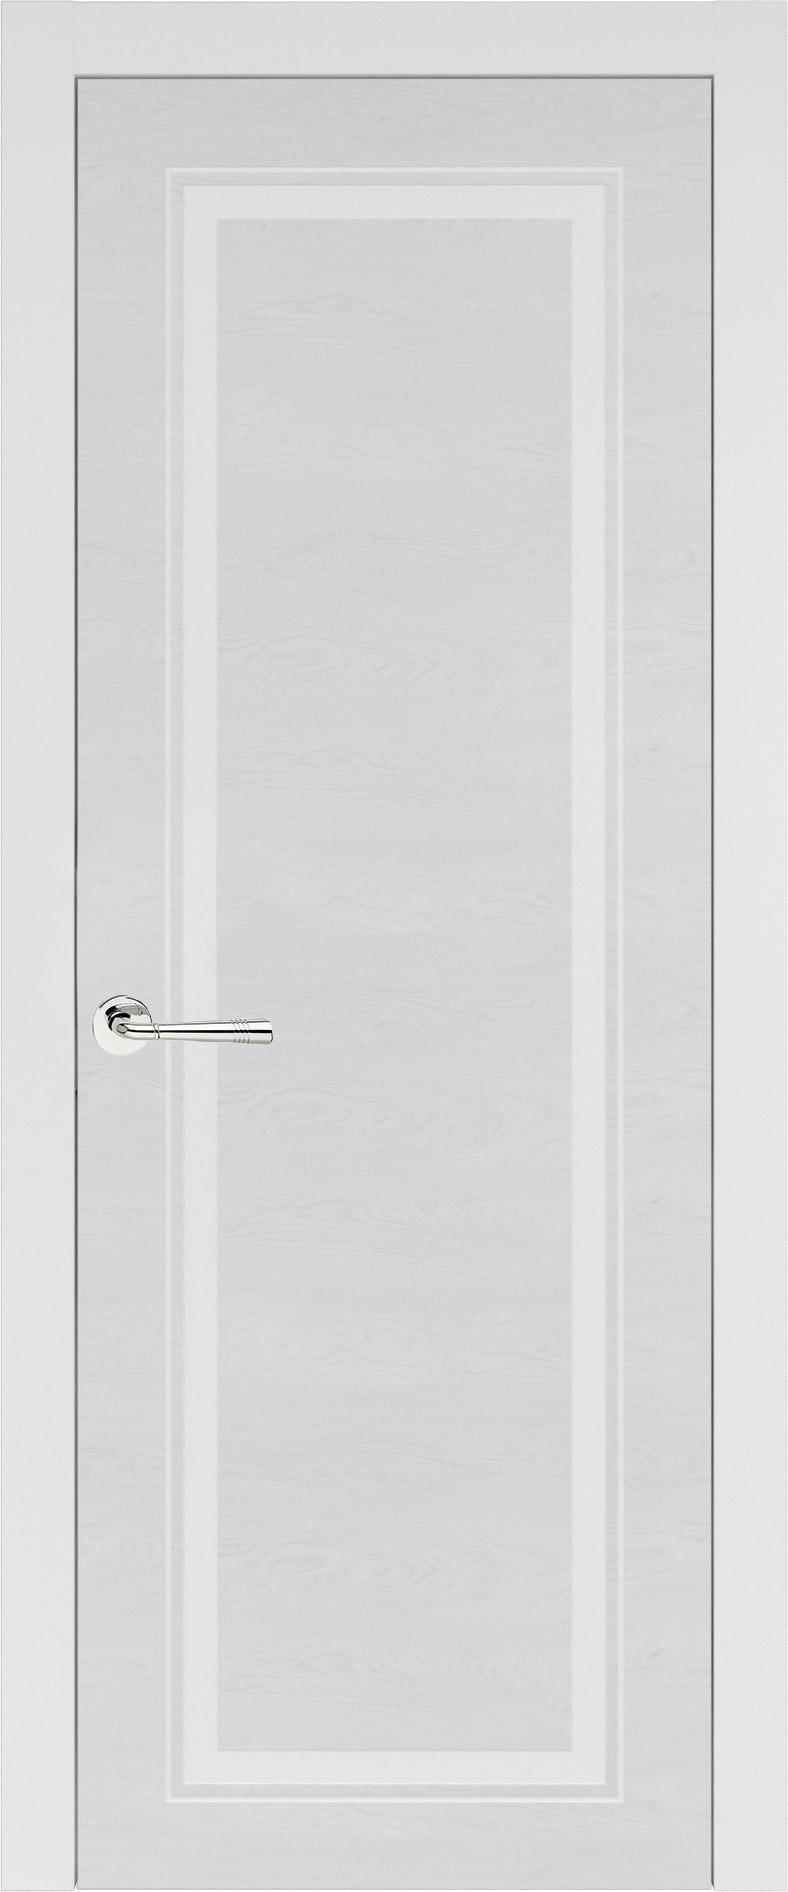 Domenica Neo Classic цвет - Белая эмаль по шпону (RAL 9003) Без стекла (ДГ)